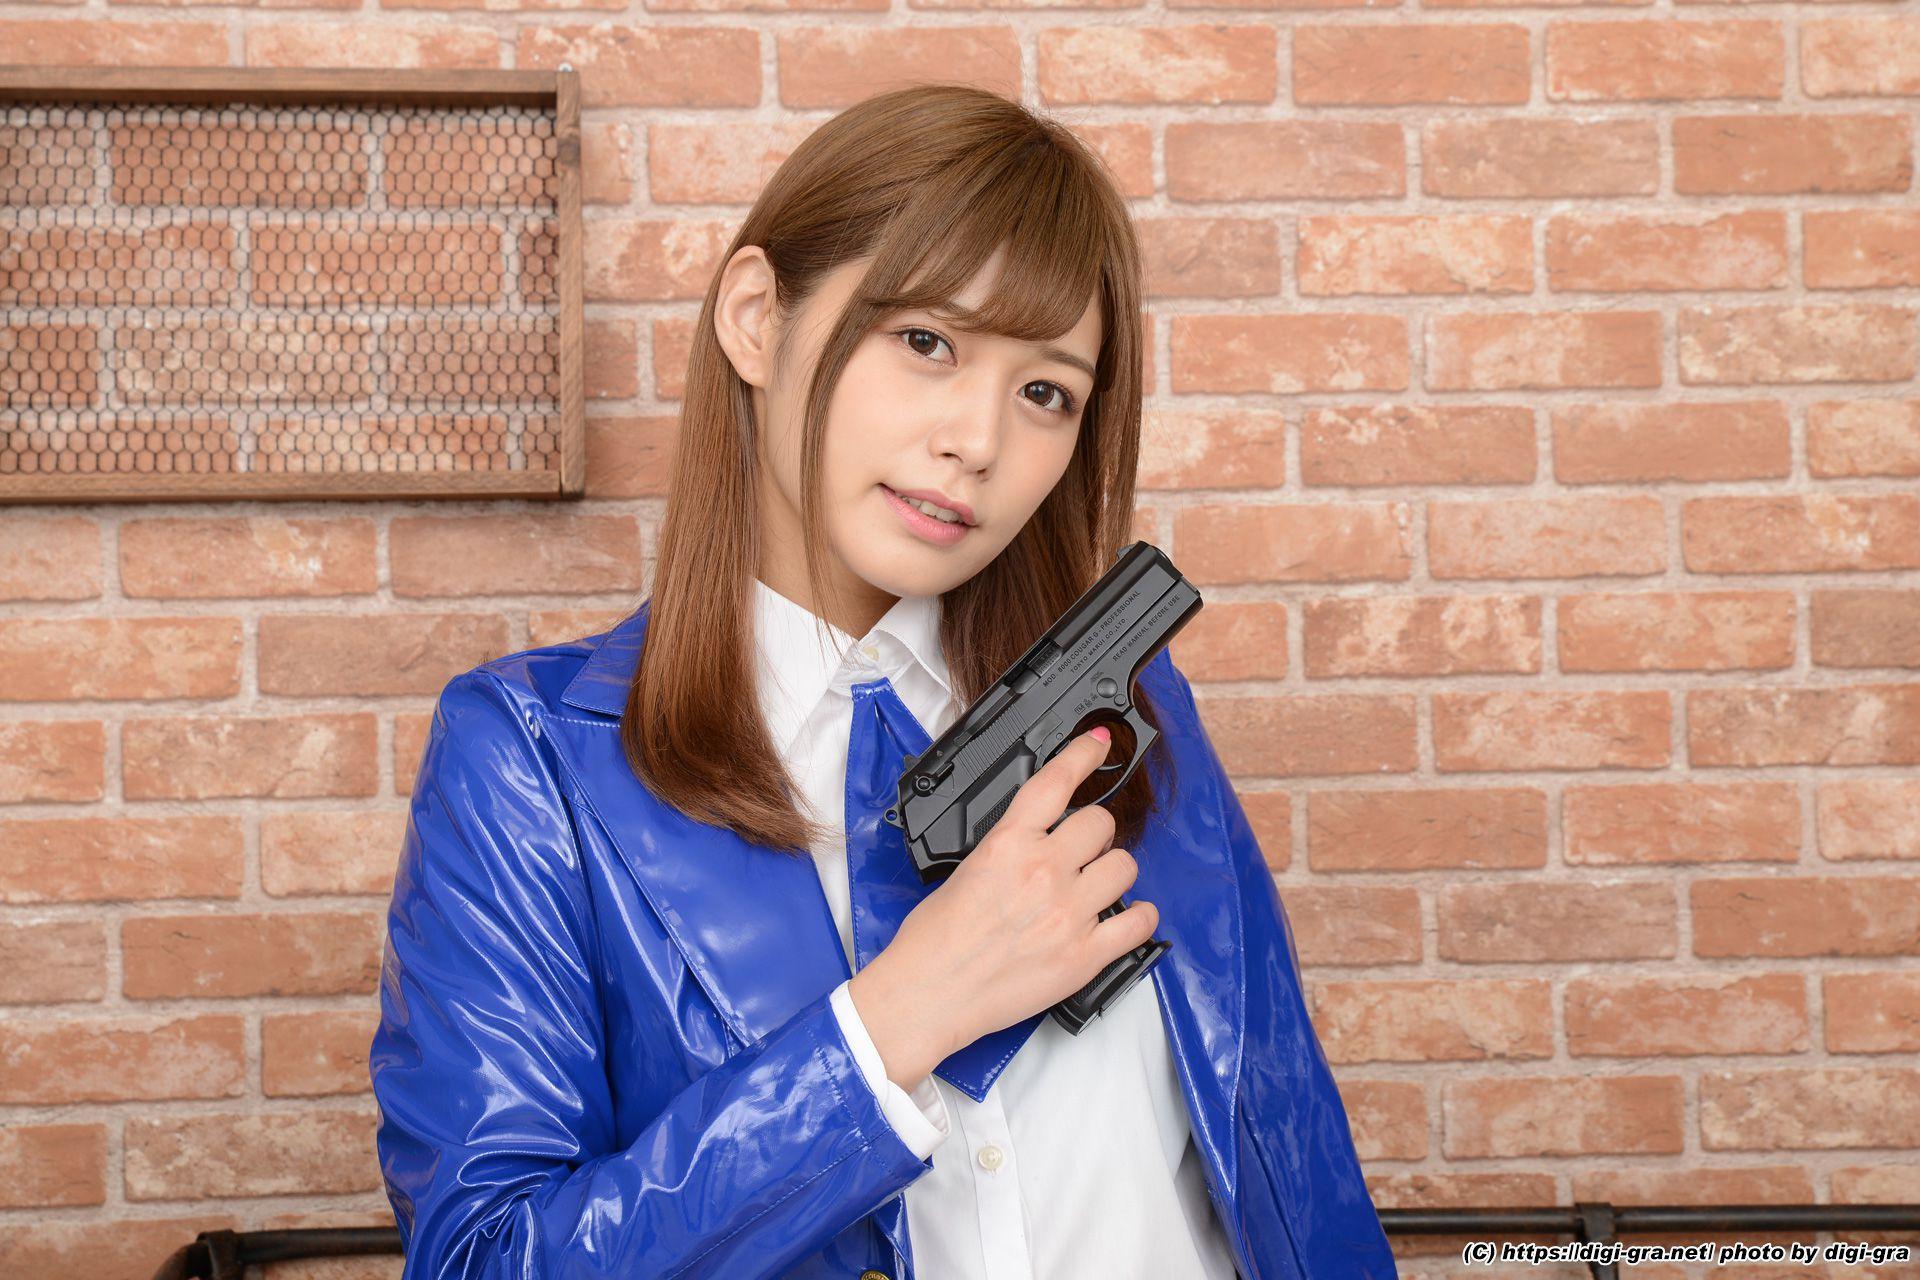 [Digi-Gra] Hikaru Konno 绀野ひかる Photoset 07 写真集[74P]插图(2)